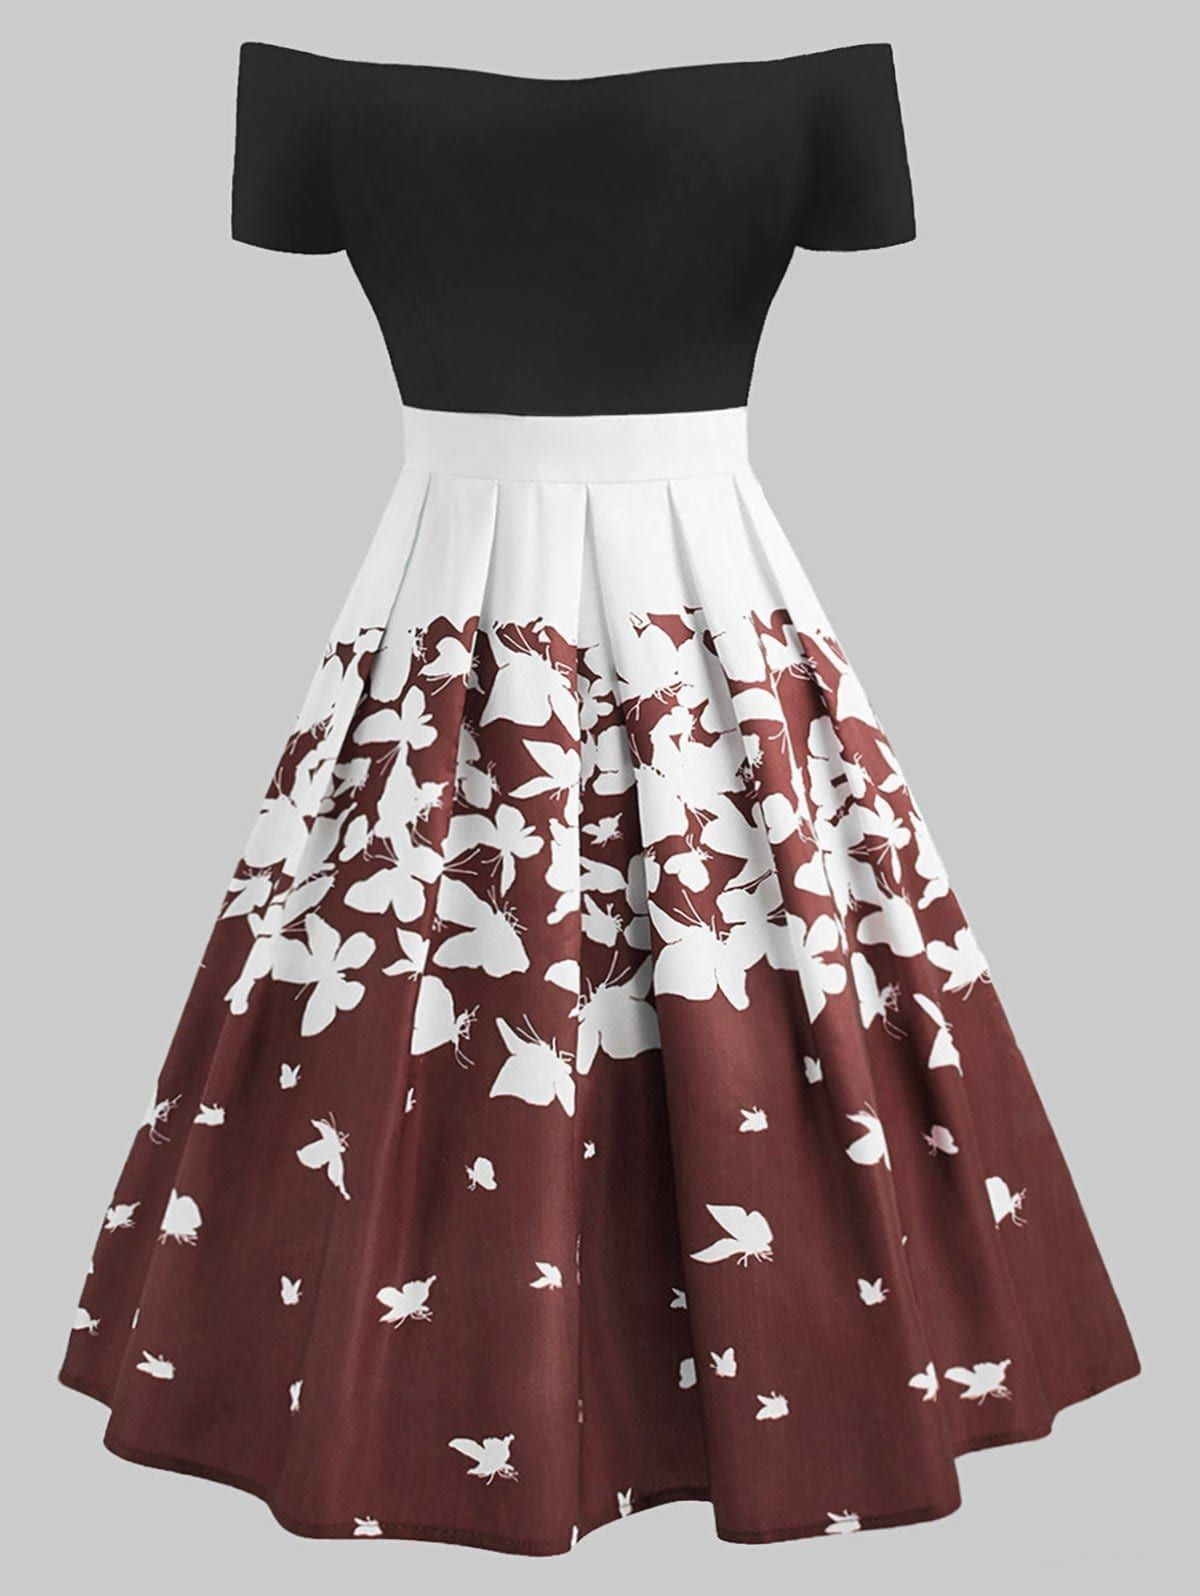 Plus Size Retro Butterfly Off The Shoulder Dress 600597300289616282 Plus Size Retro Dresses Retro Dress Fancy Dresses [ 1596 x 1200 Pixel ]